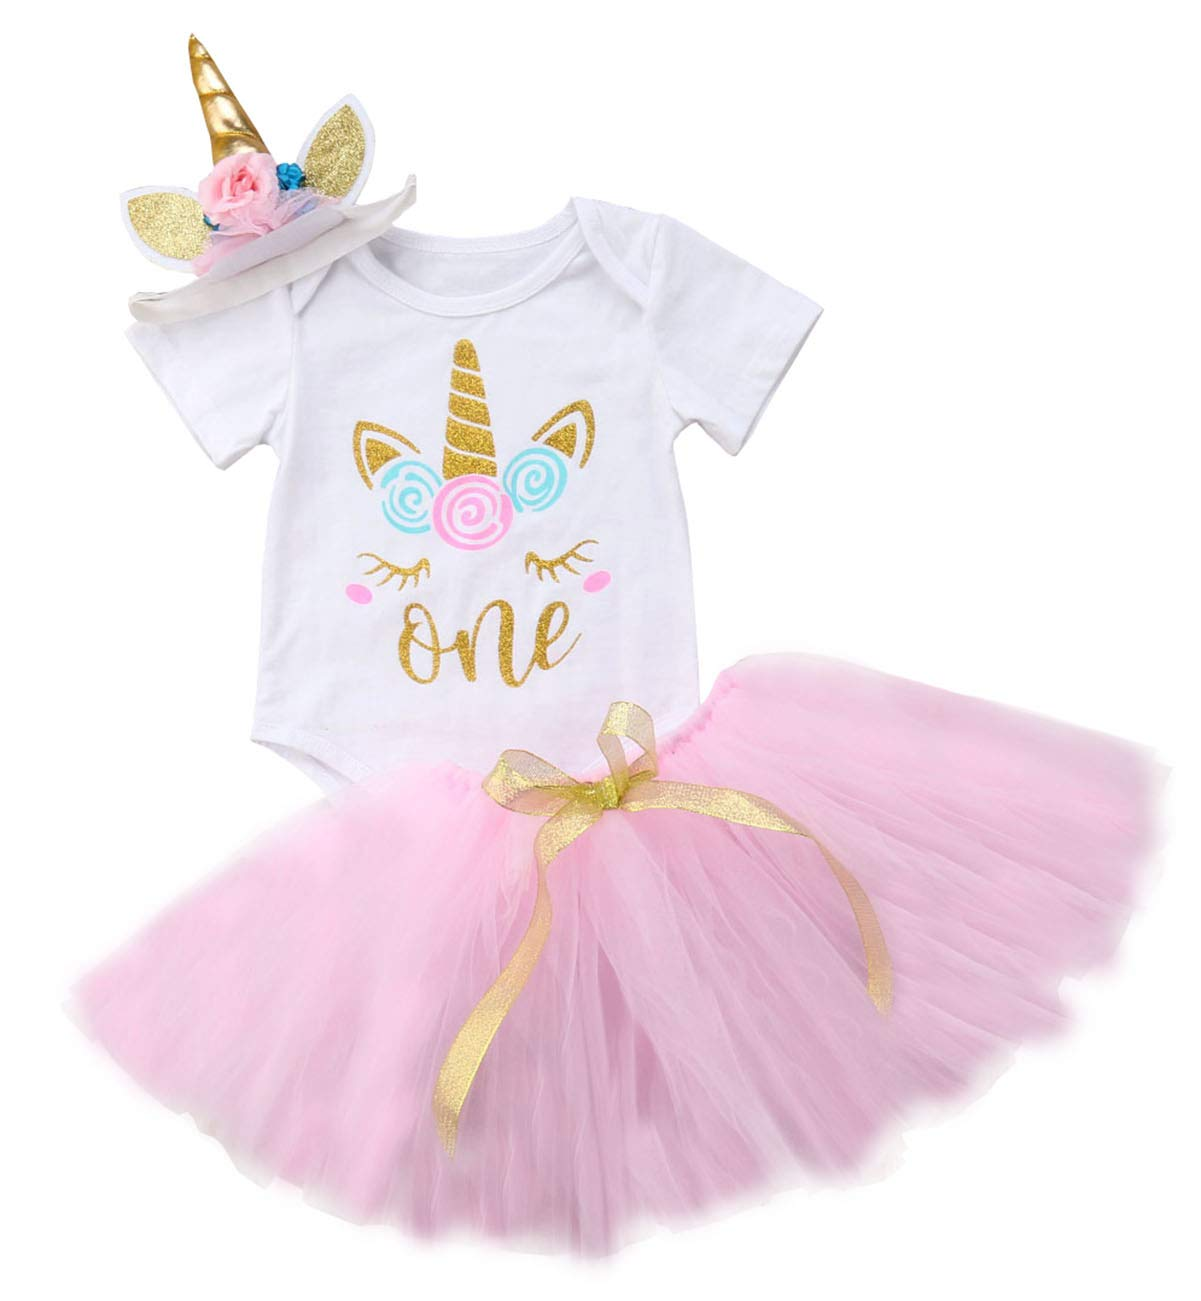 1st Birthday Unicorn Outfit Unicorn Romper